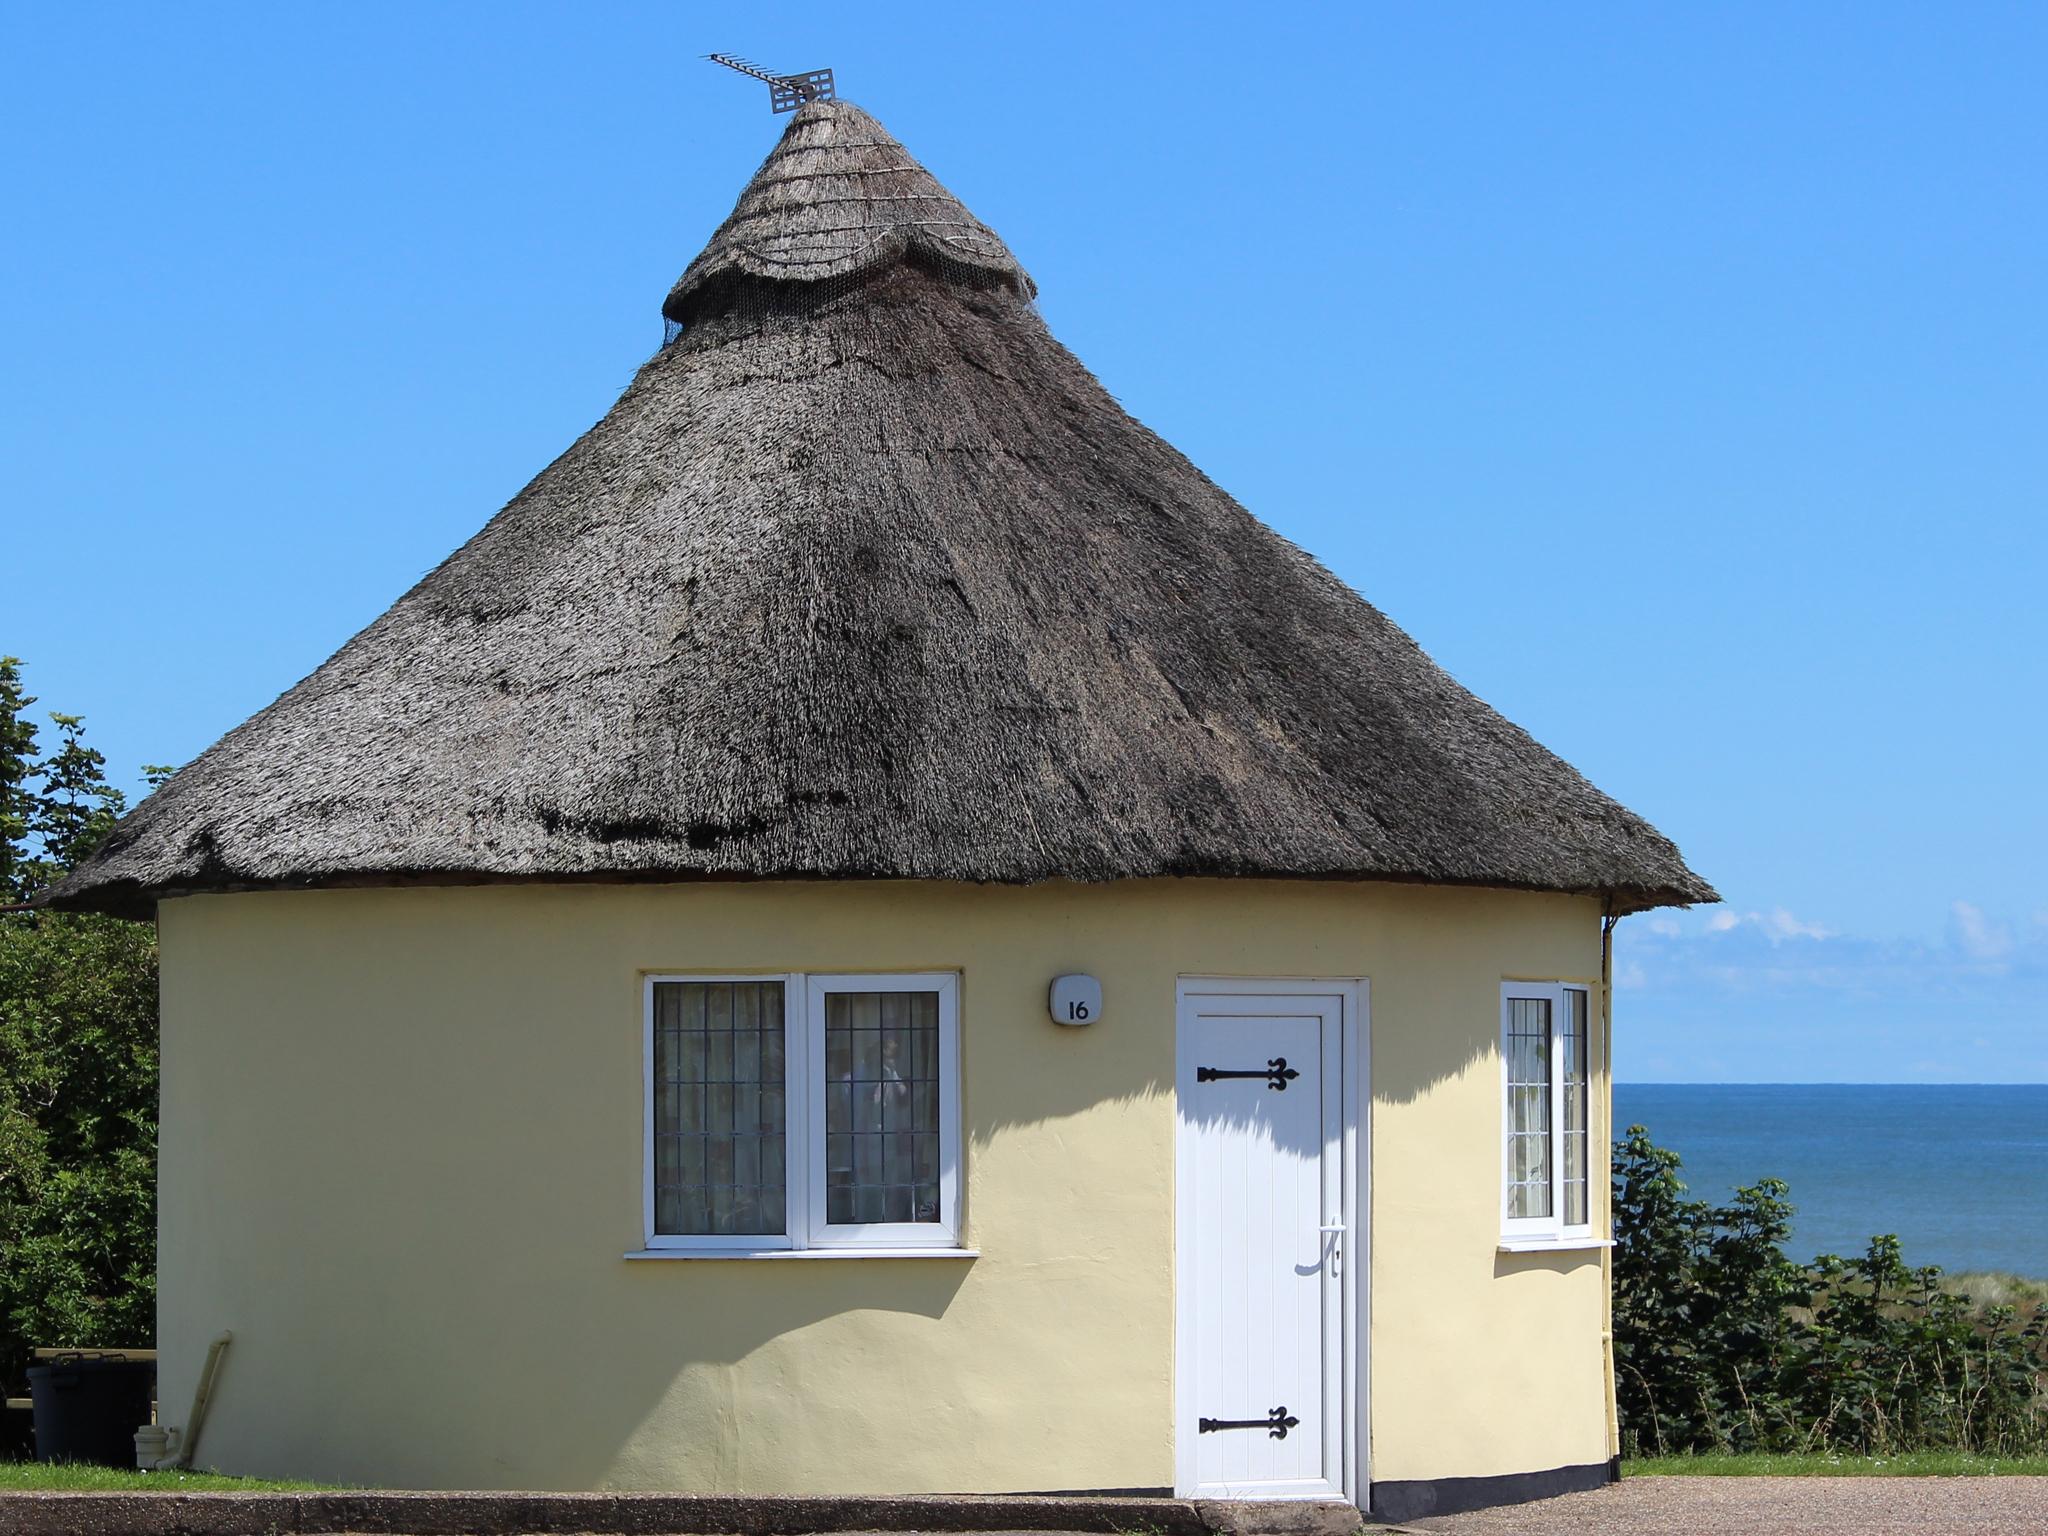 17 reasons to visit Norfolk